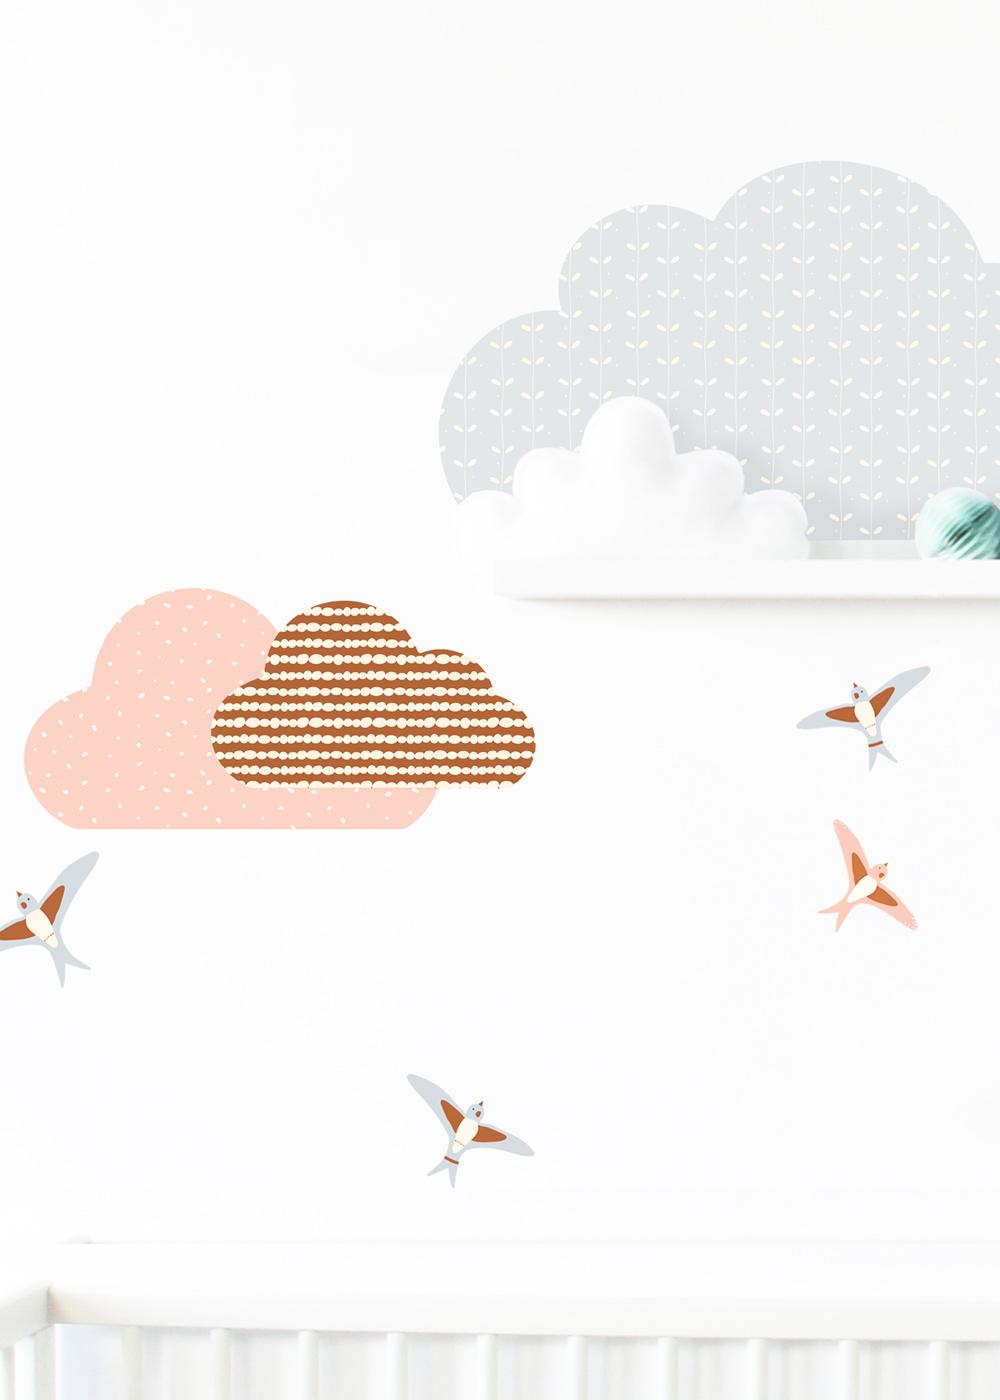 Ikea Mosslanda Bilderleiste Musta Wolken rose camel Teilansicht Vögel